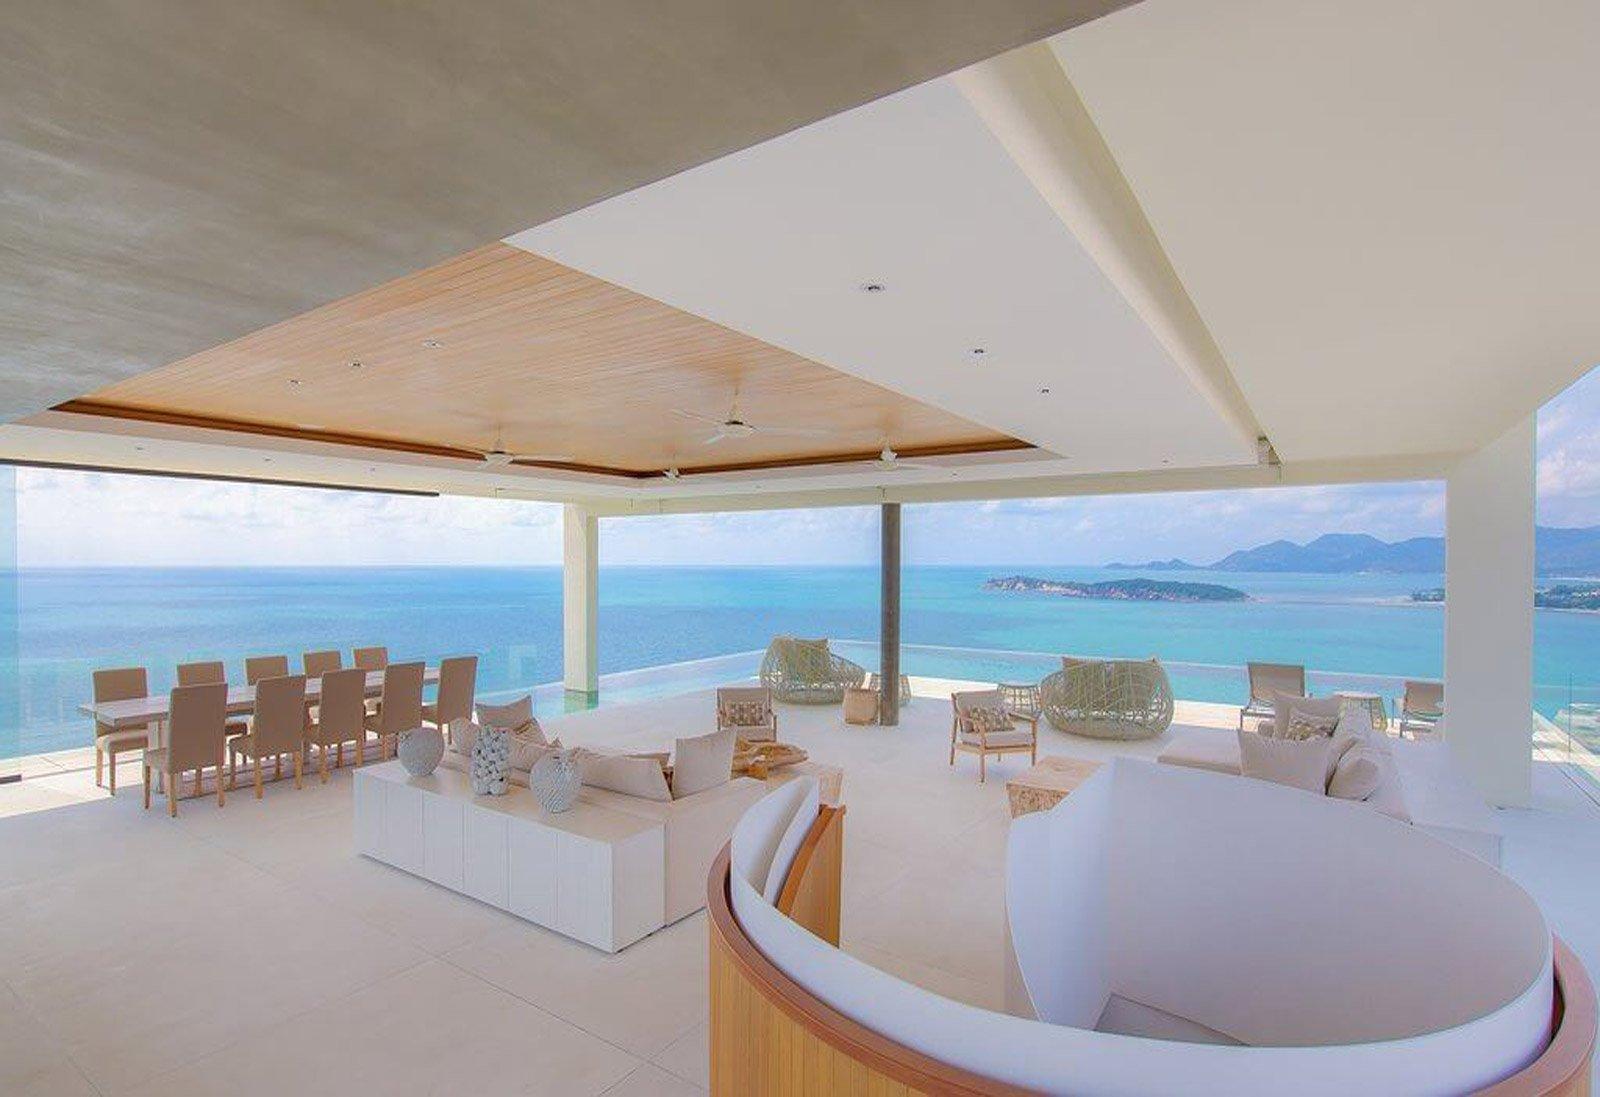 Villa Samujana - Modern Contemporary Interior Design Service in Phuket & Samui